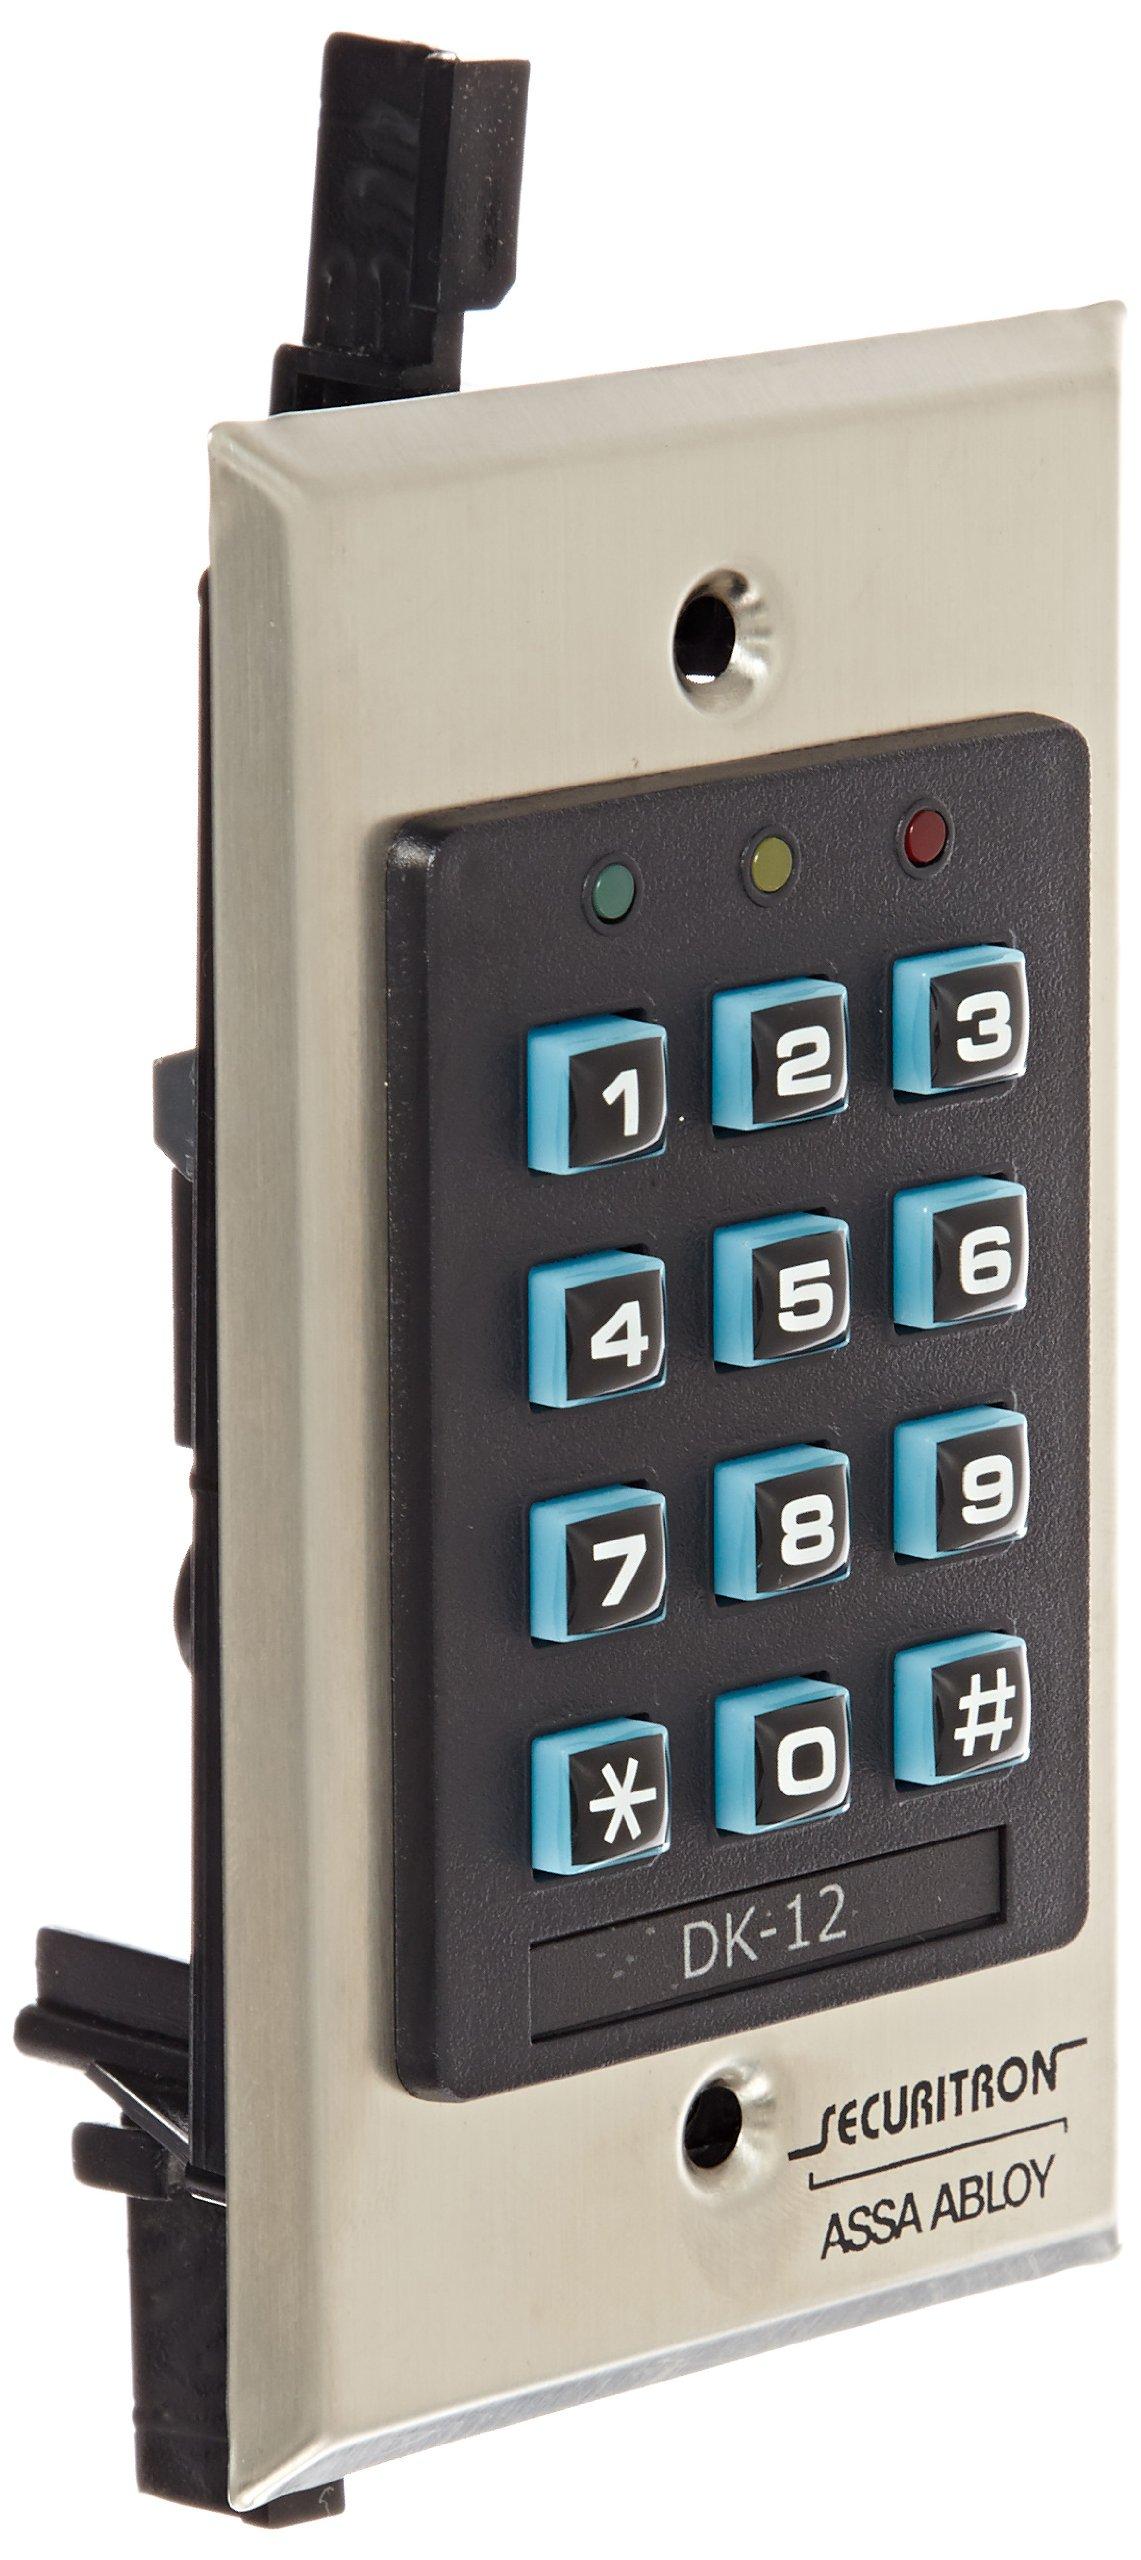 Securitron Single Gang Digital Keypad System with Illuminated Keys, 99 User Code Capability by Securitron